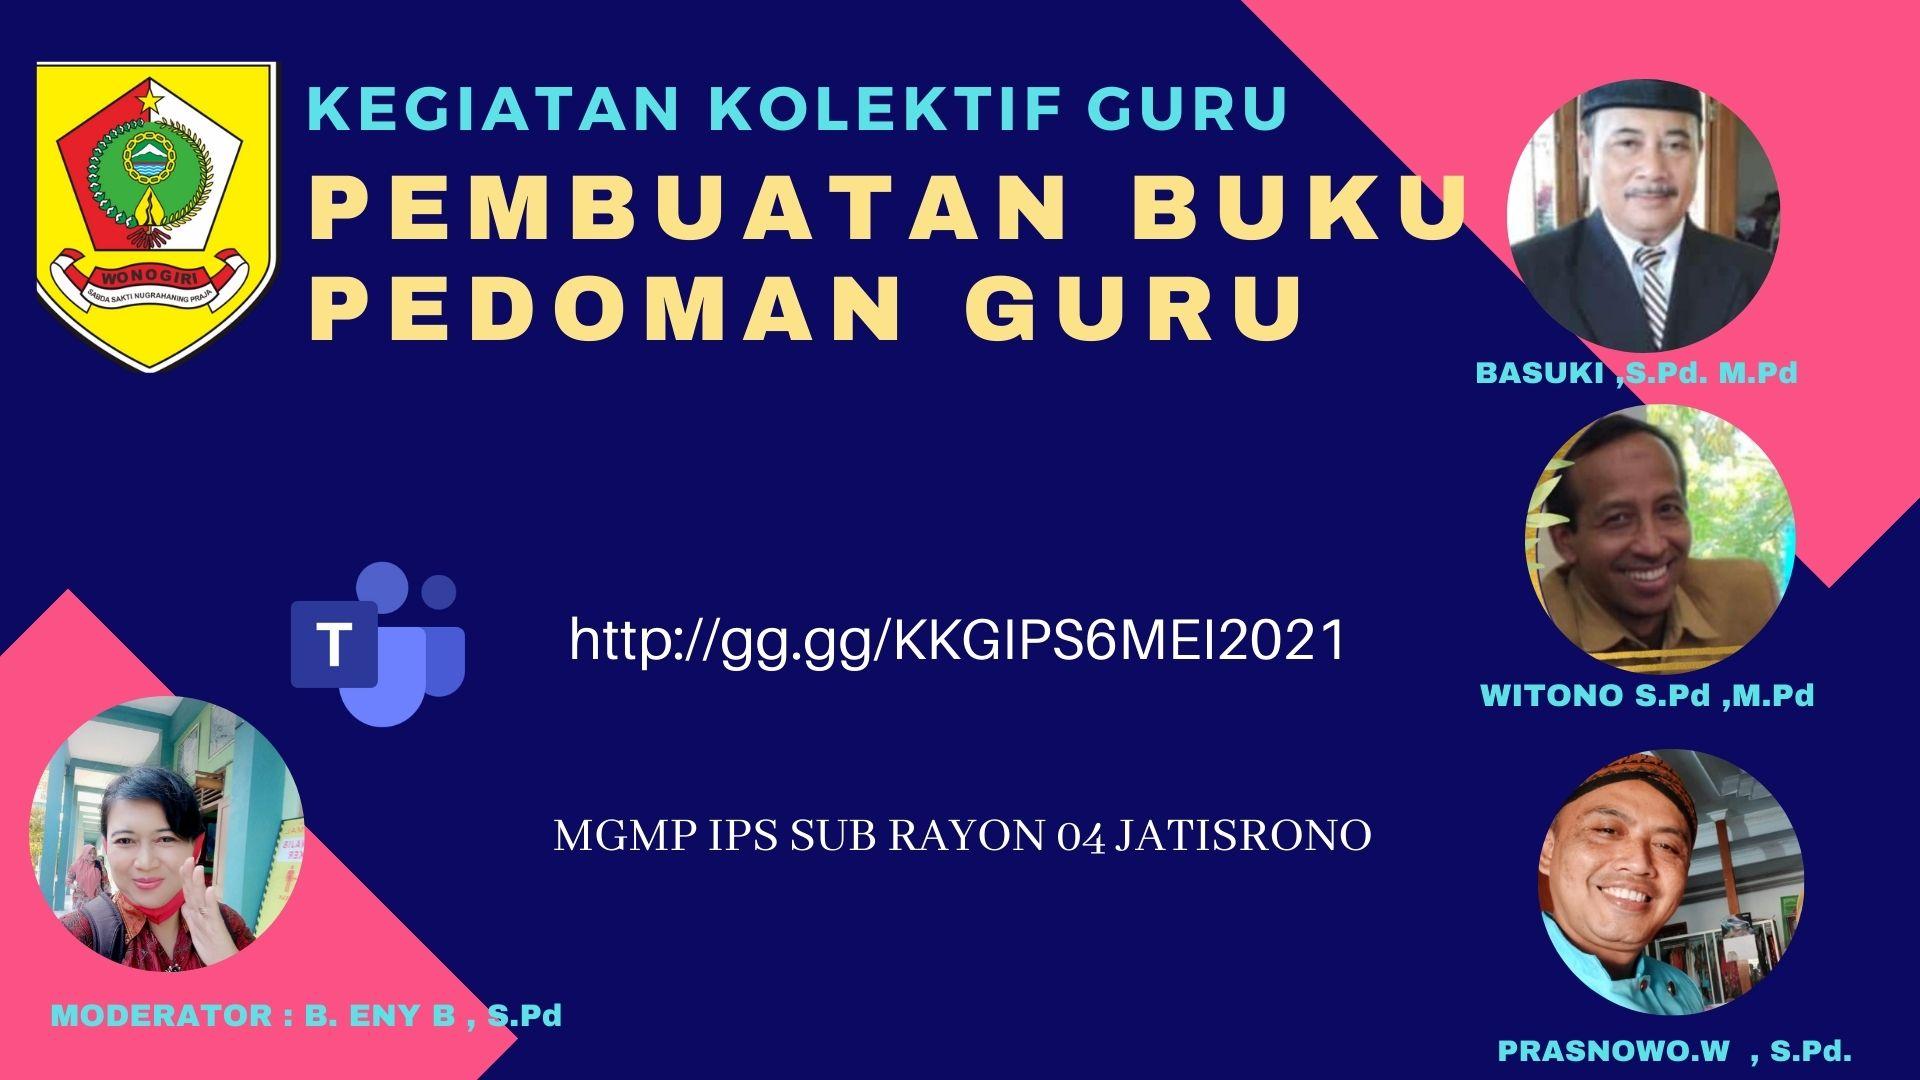 MGMP IPS Subrayon 04 Gelar KKG Pembuatan  Buku Pedoman Guru